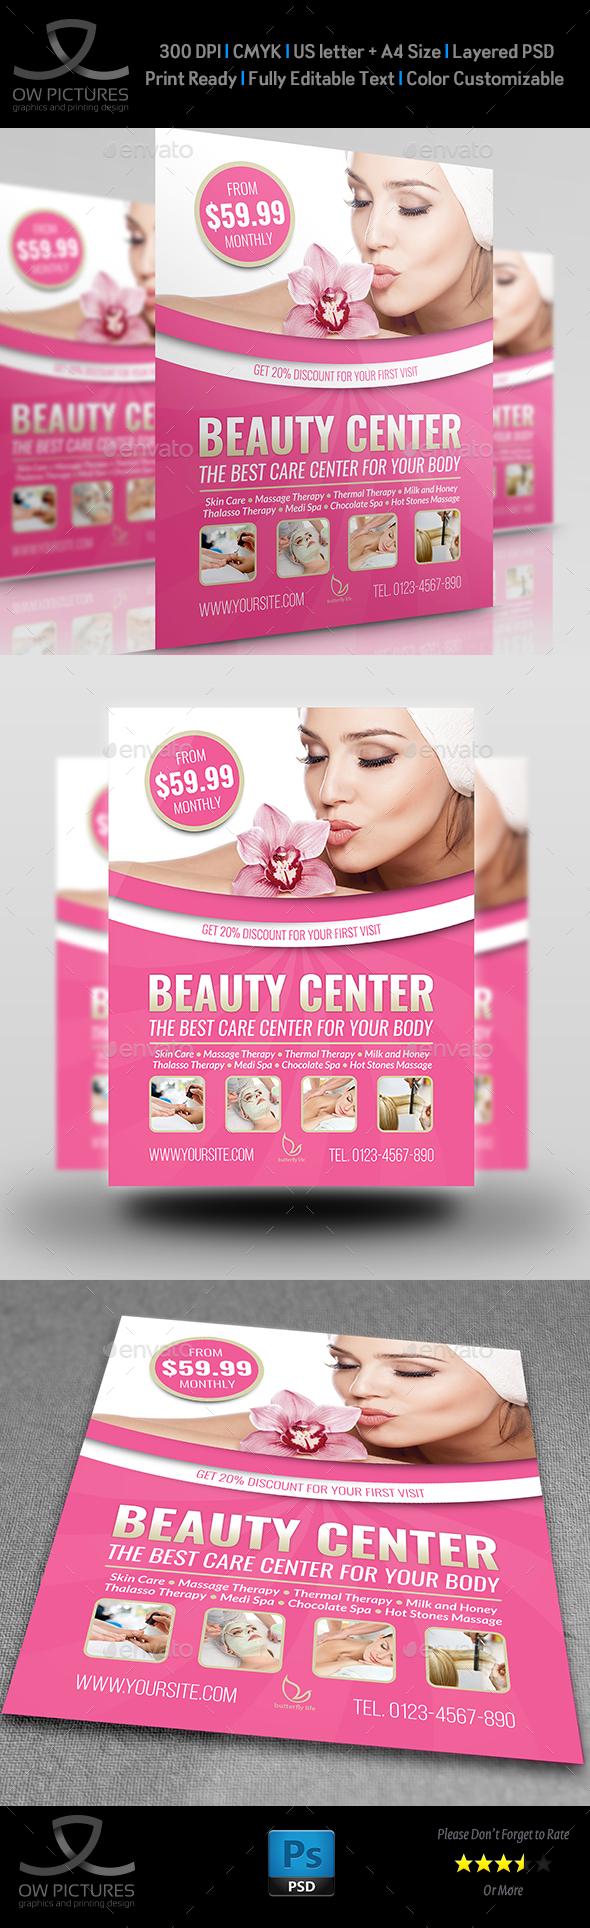 Beauty Center Flyer Template - Flyers Print Templates